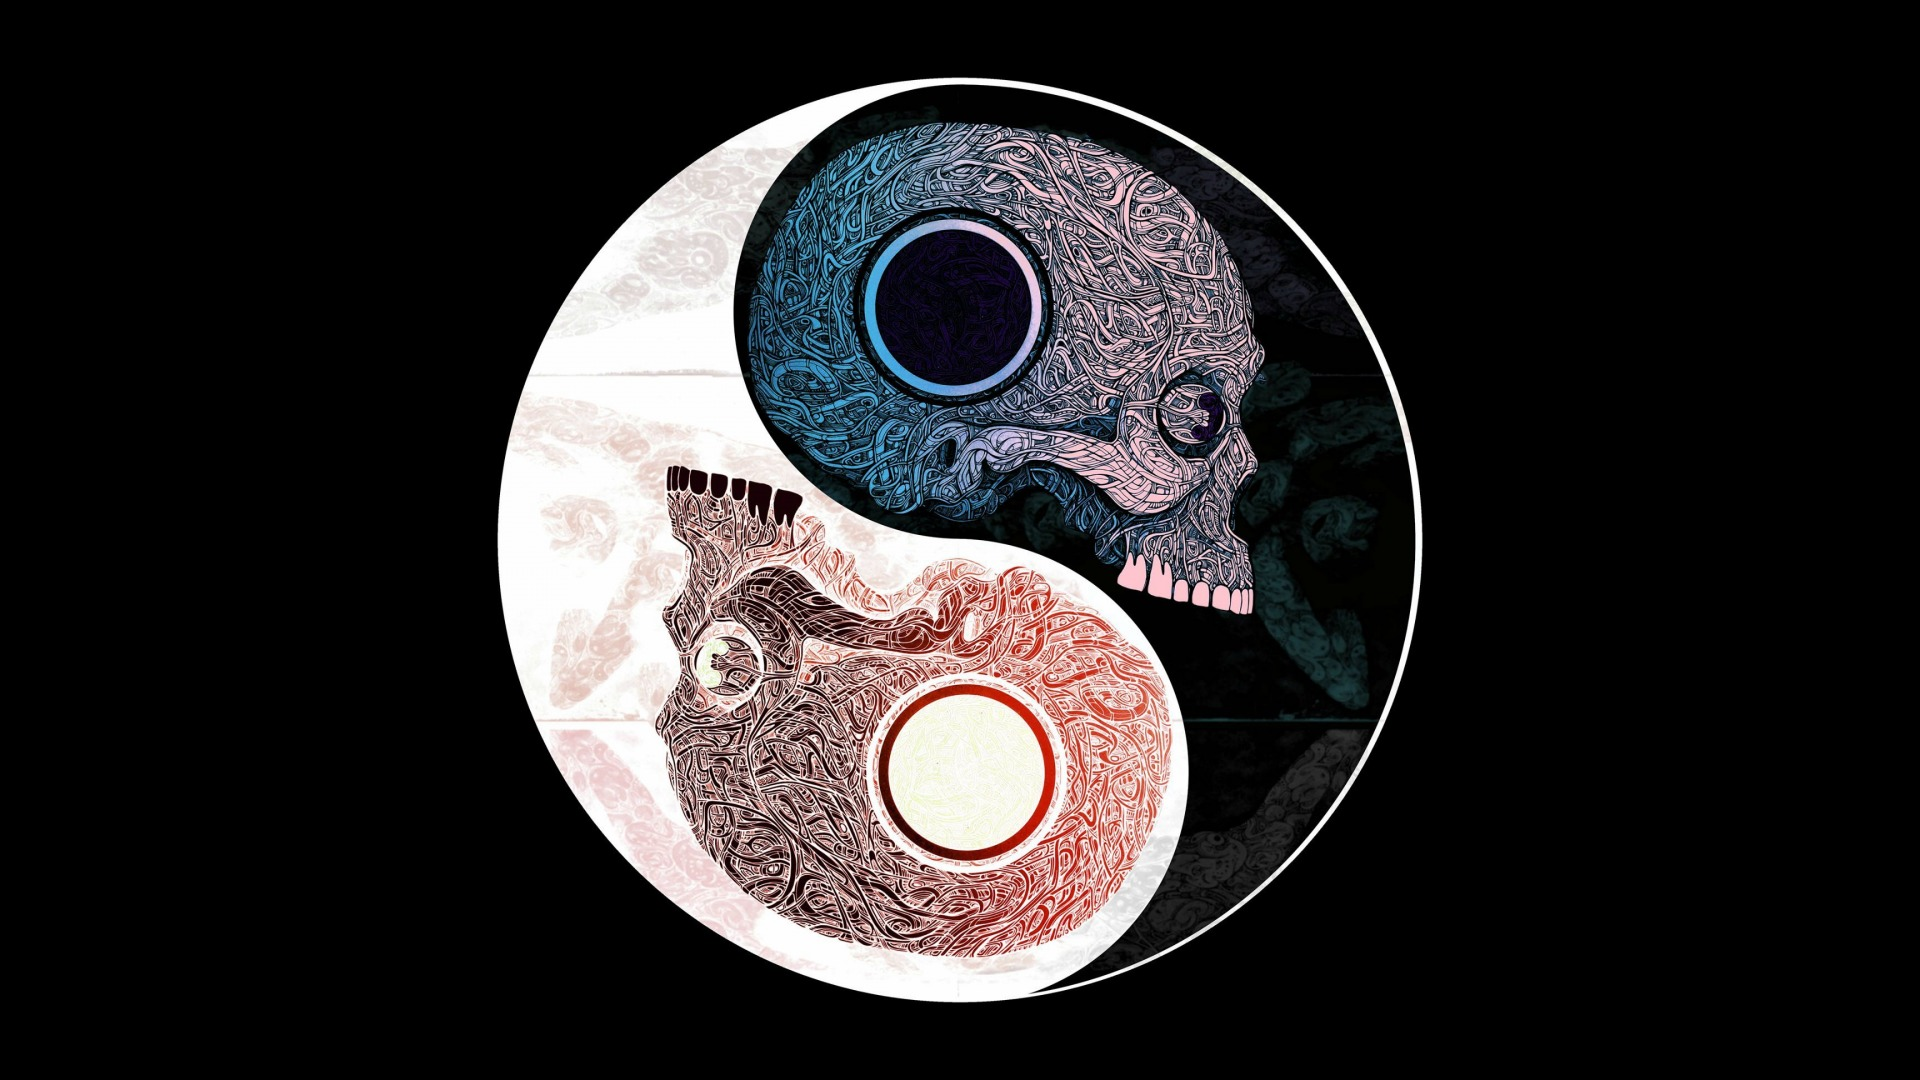 Skulls yin yang symbol pattern art on black background 1920x1080